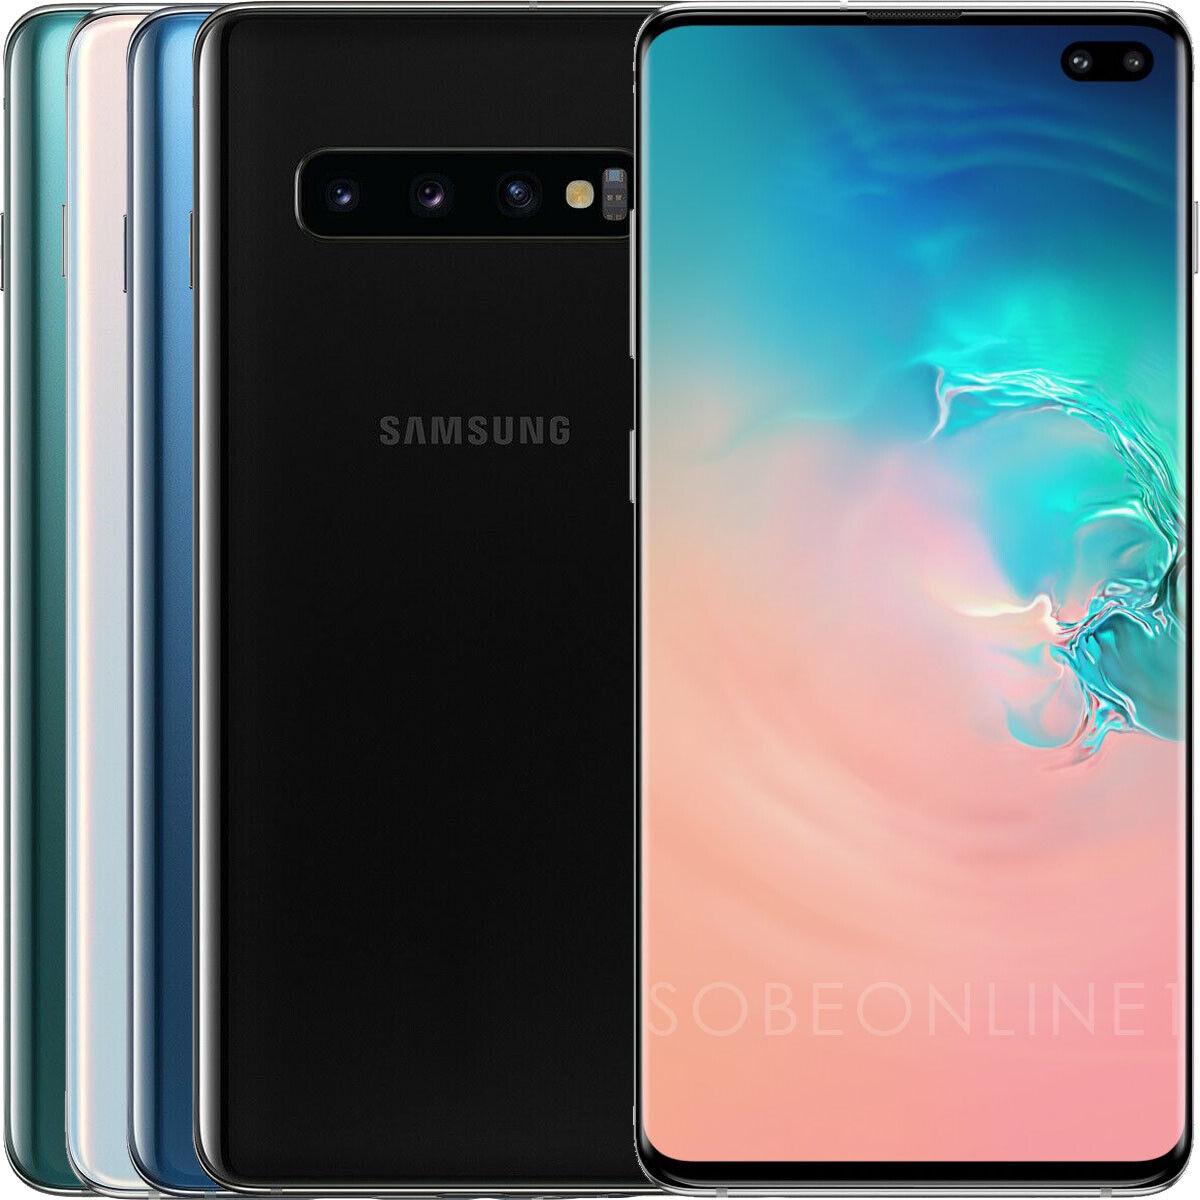 Samsung Galaxy S10+ Plus SM-G975F/DS 128GB 8GB (FACTORY UNLOCKED) 6.4